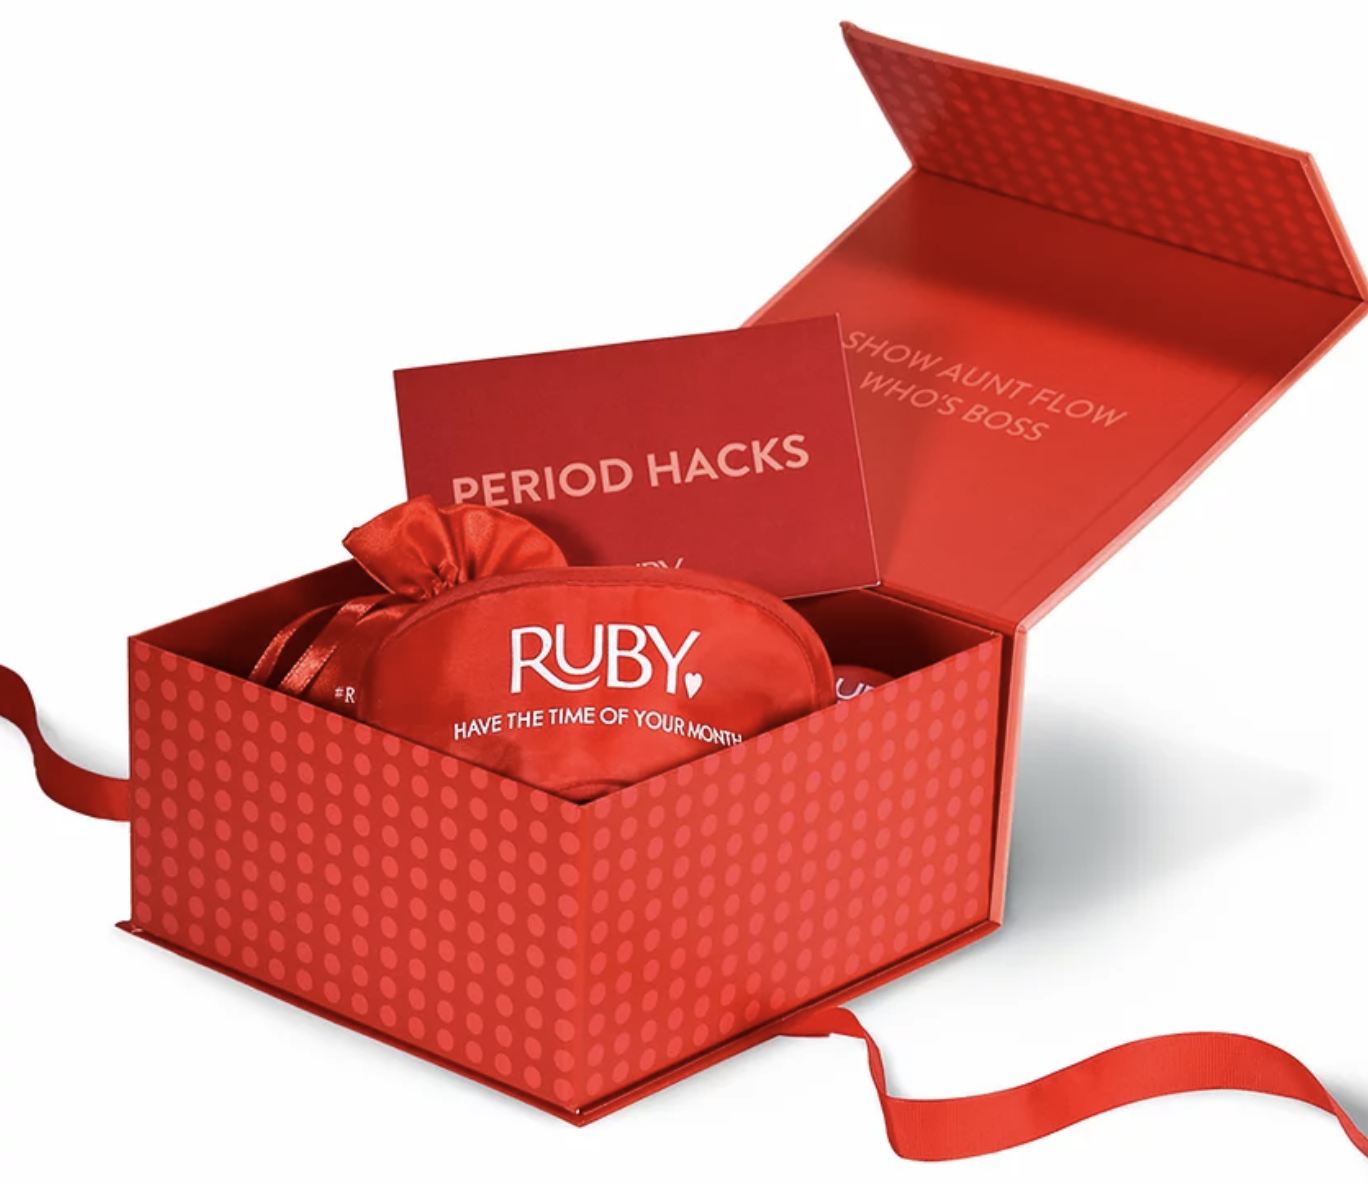 The Ruby Love box